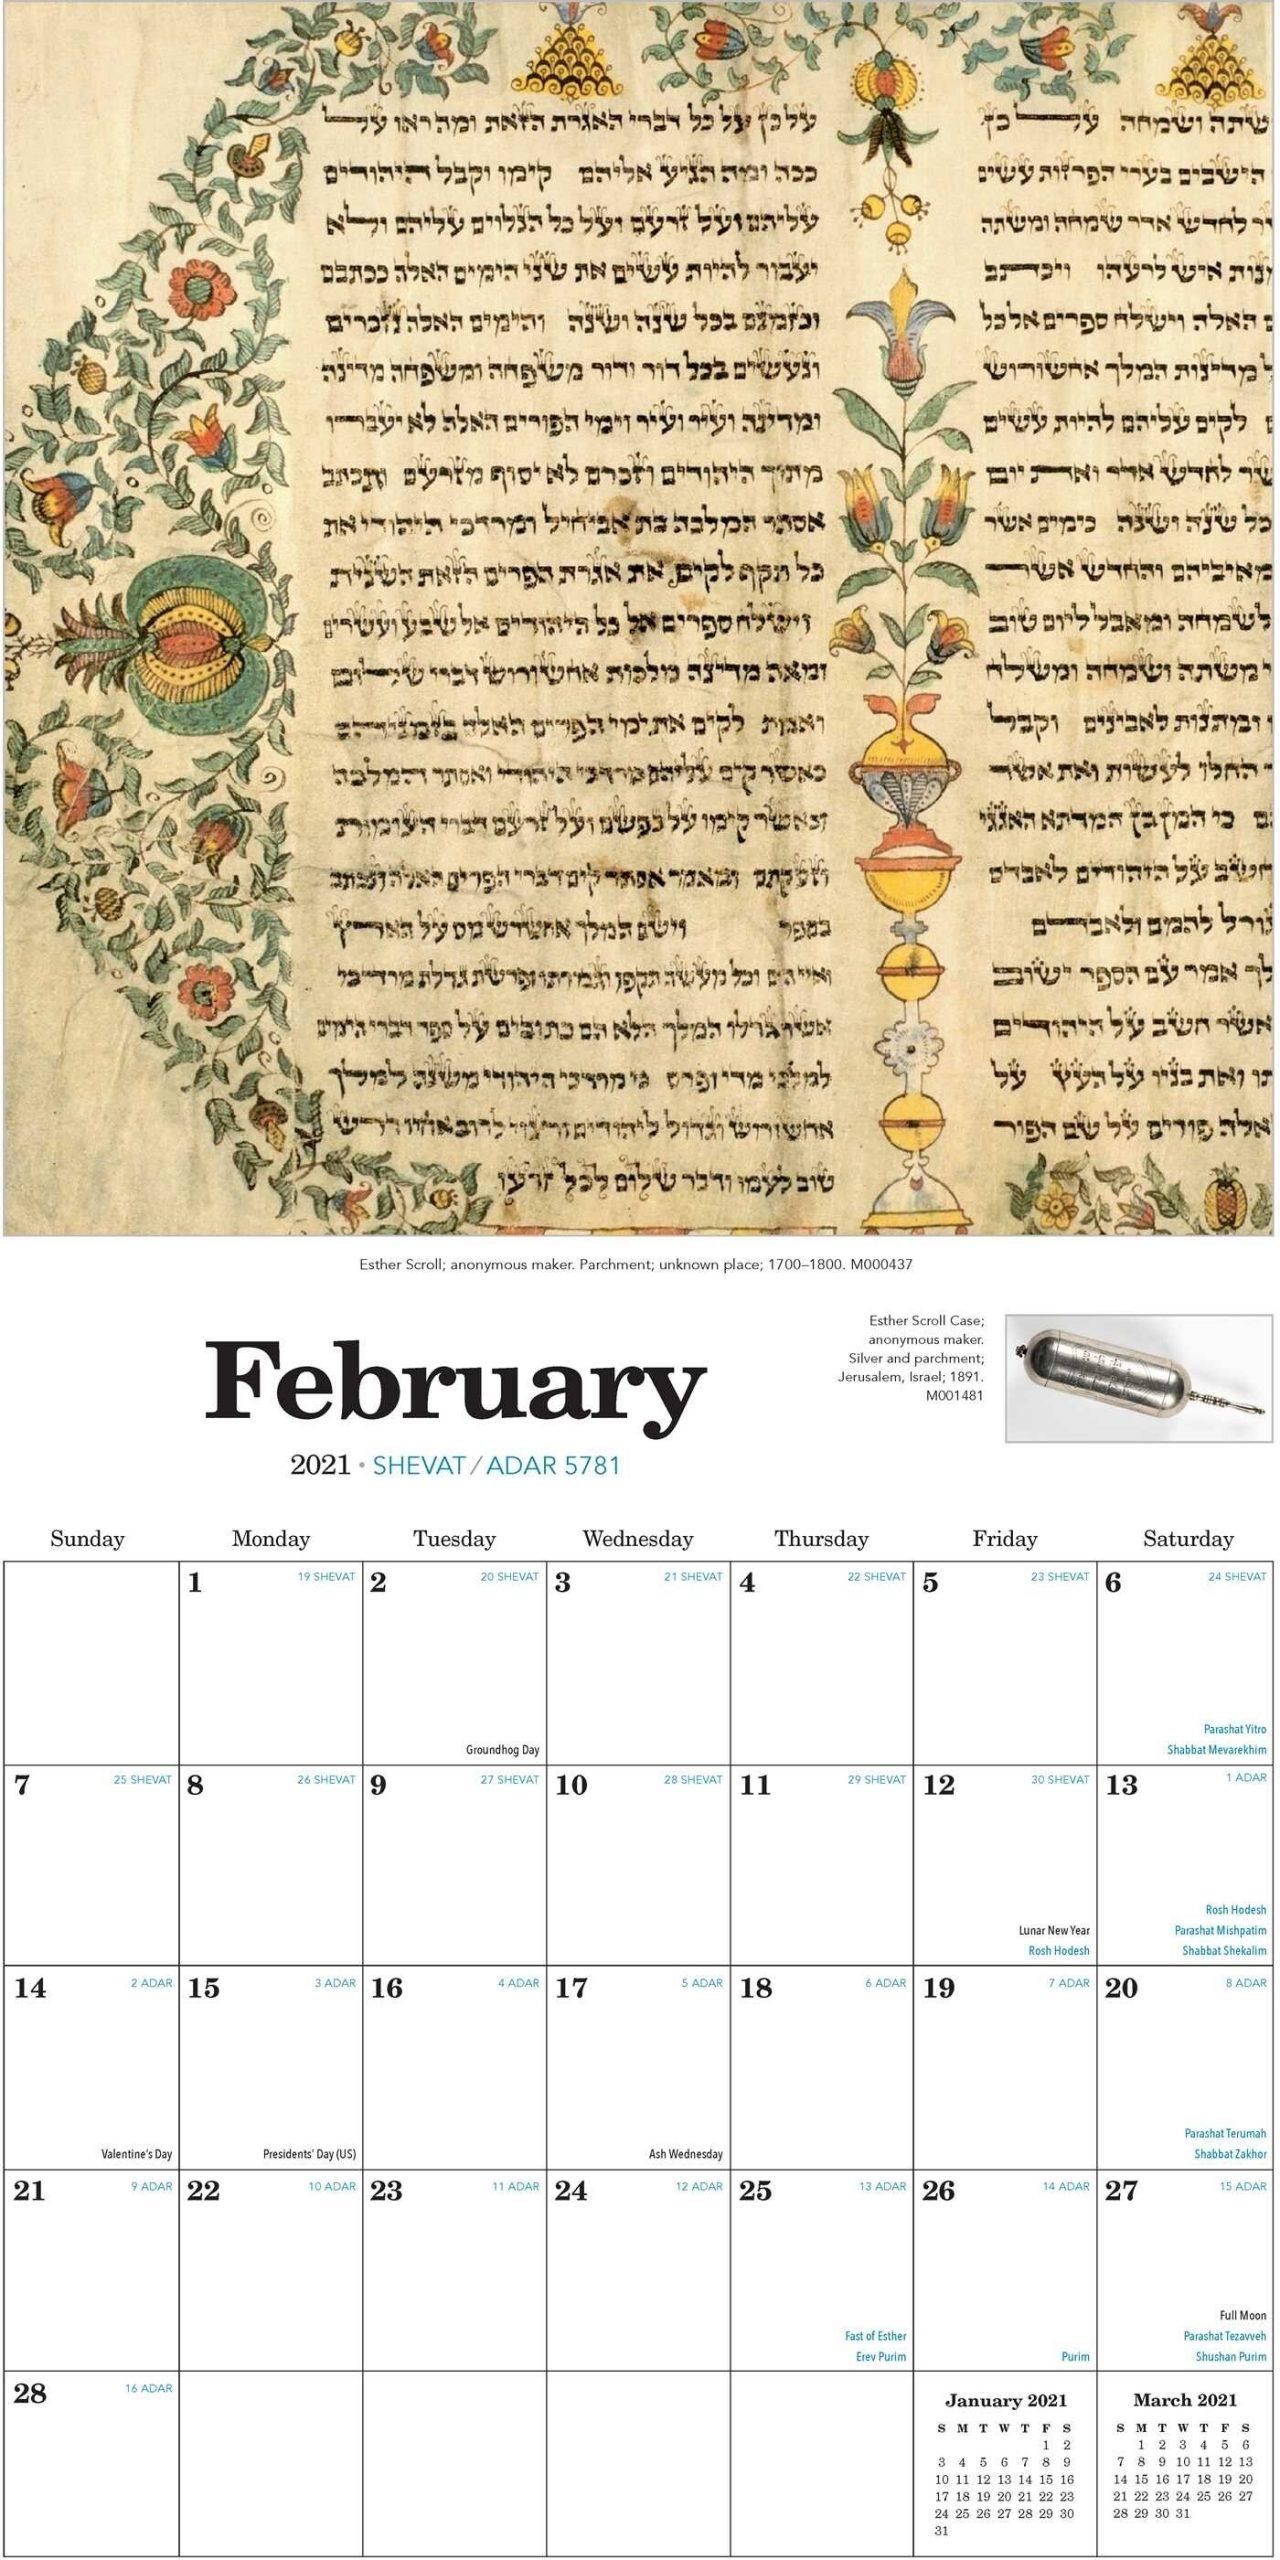 The 2021 Jewish Calendar 16-Month Wall Calendar - Book-Jewish Calendar May 2021